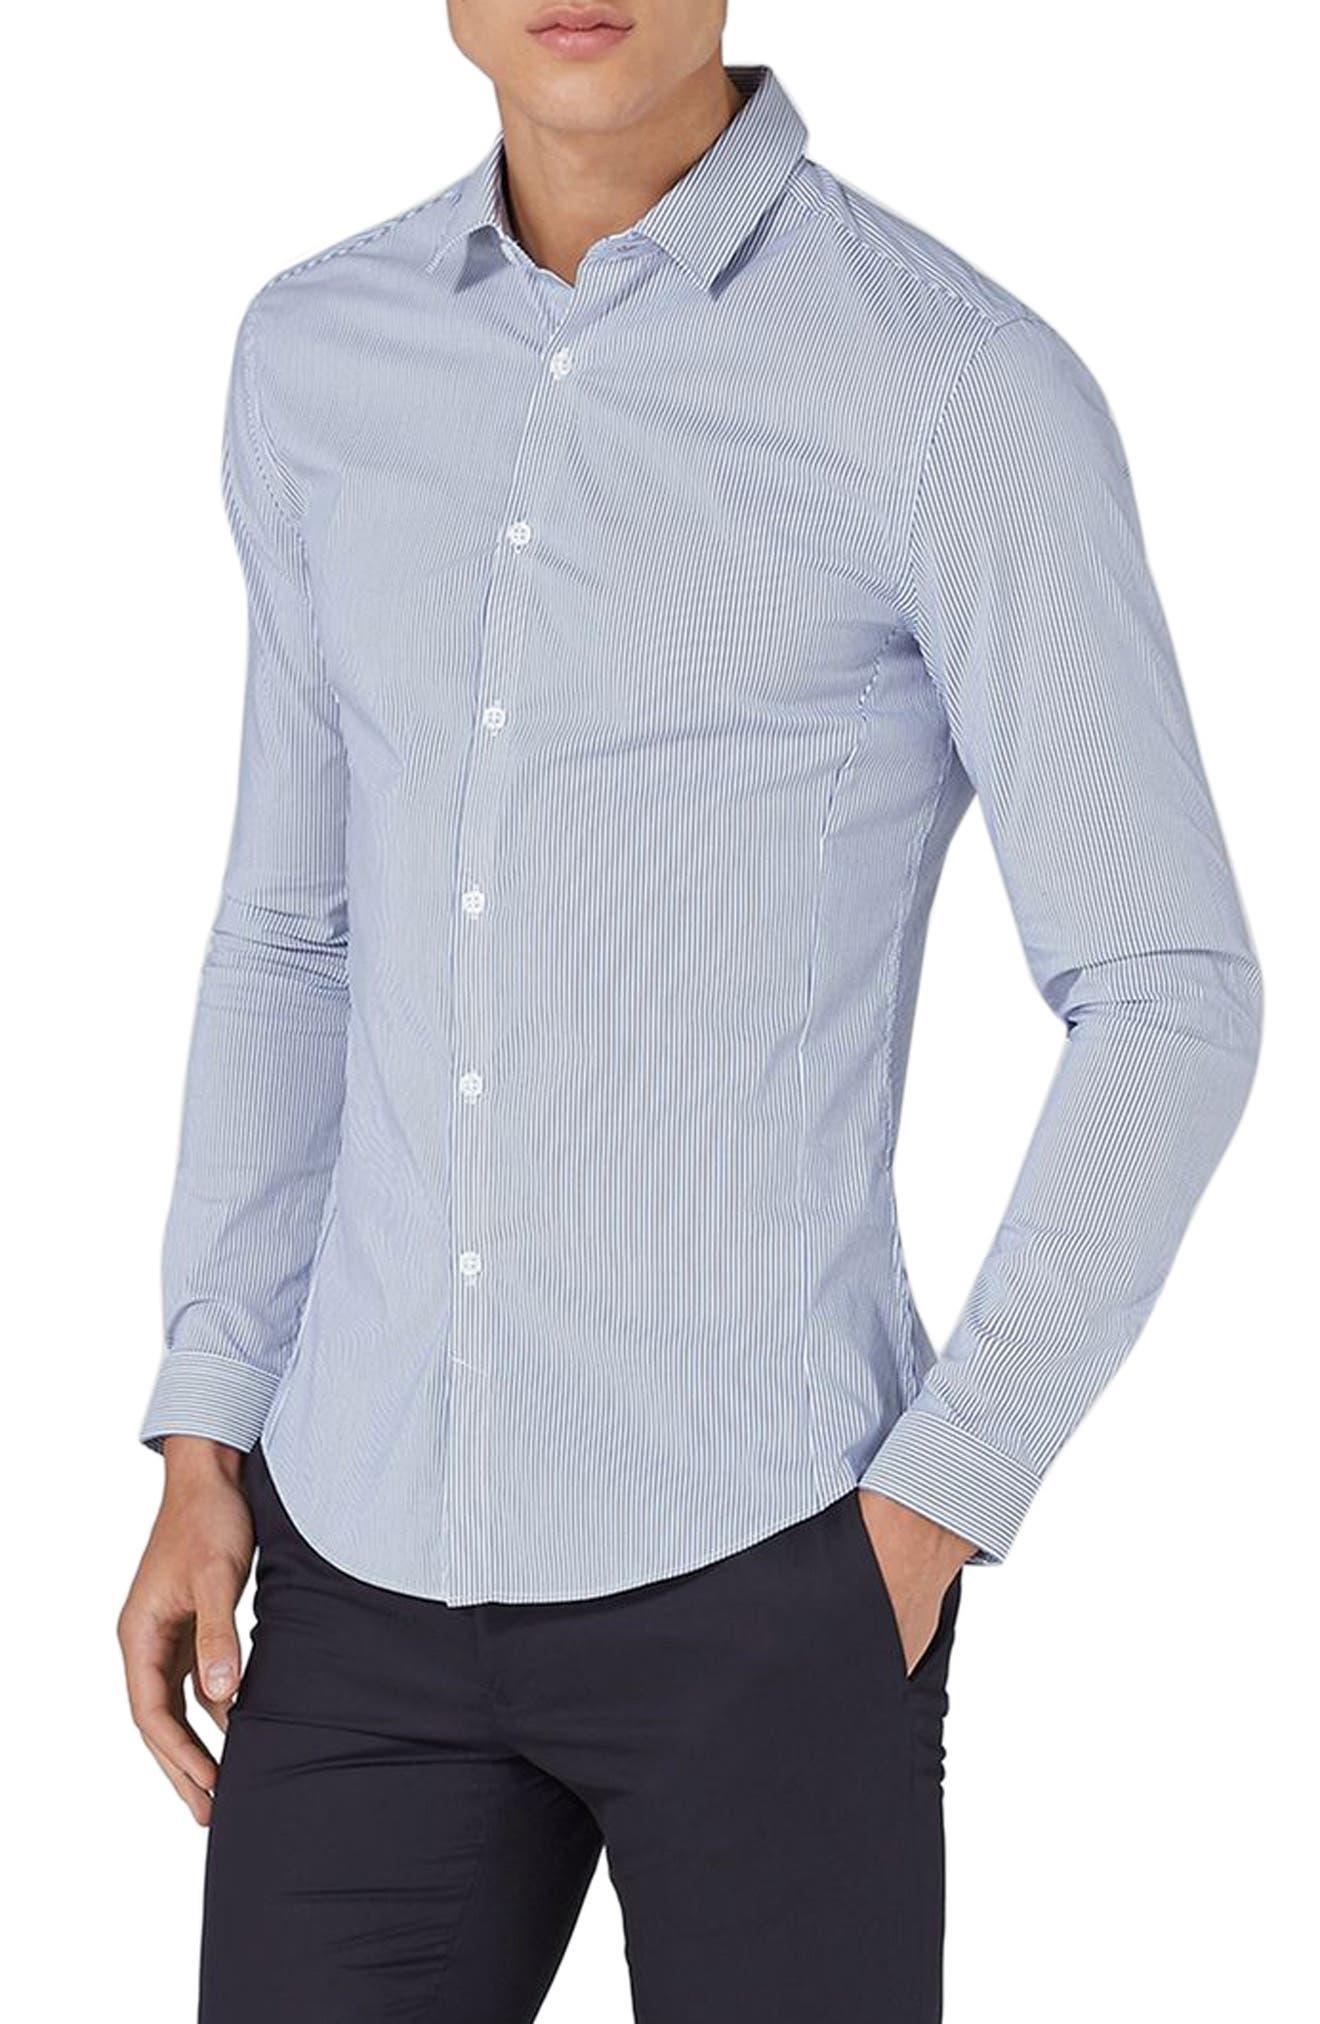 Muscle Fit Smart Shirt,                             Main thumbnail 1, color,                             Blue Multi